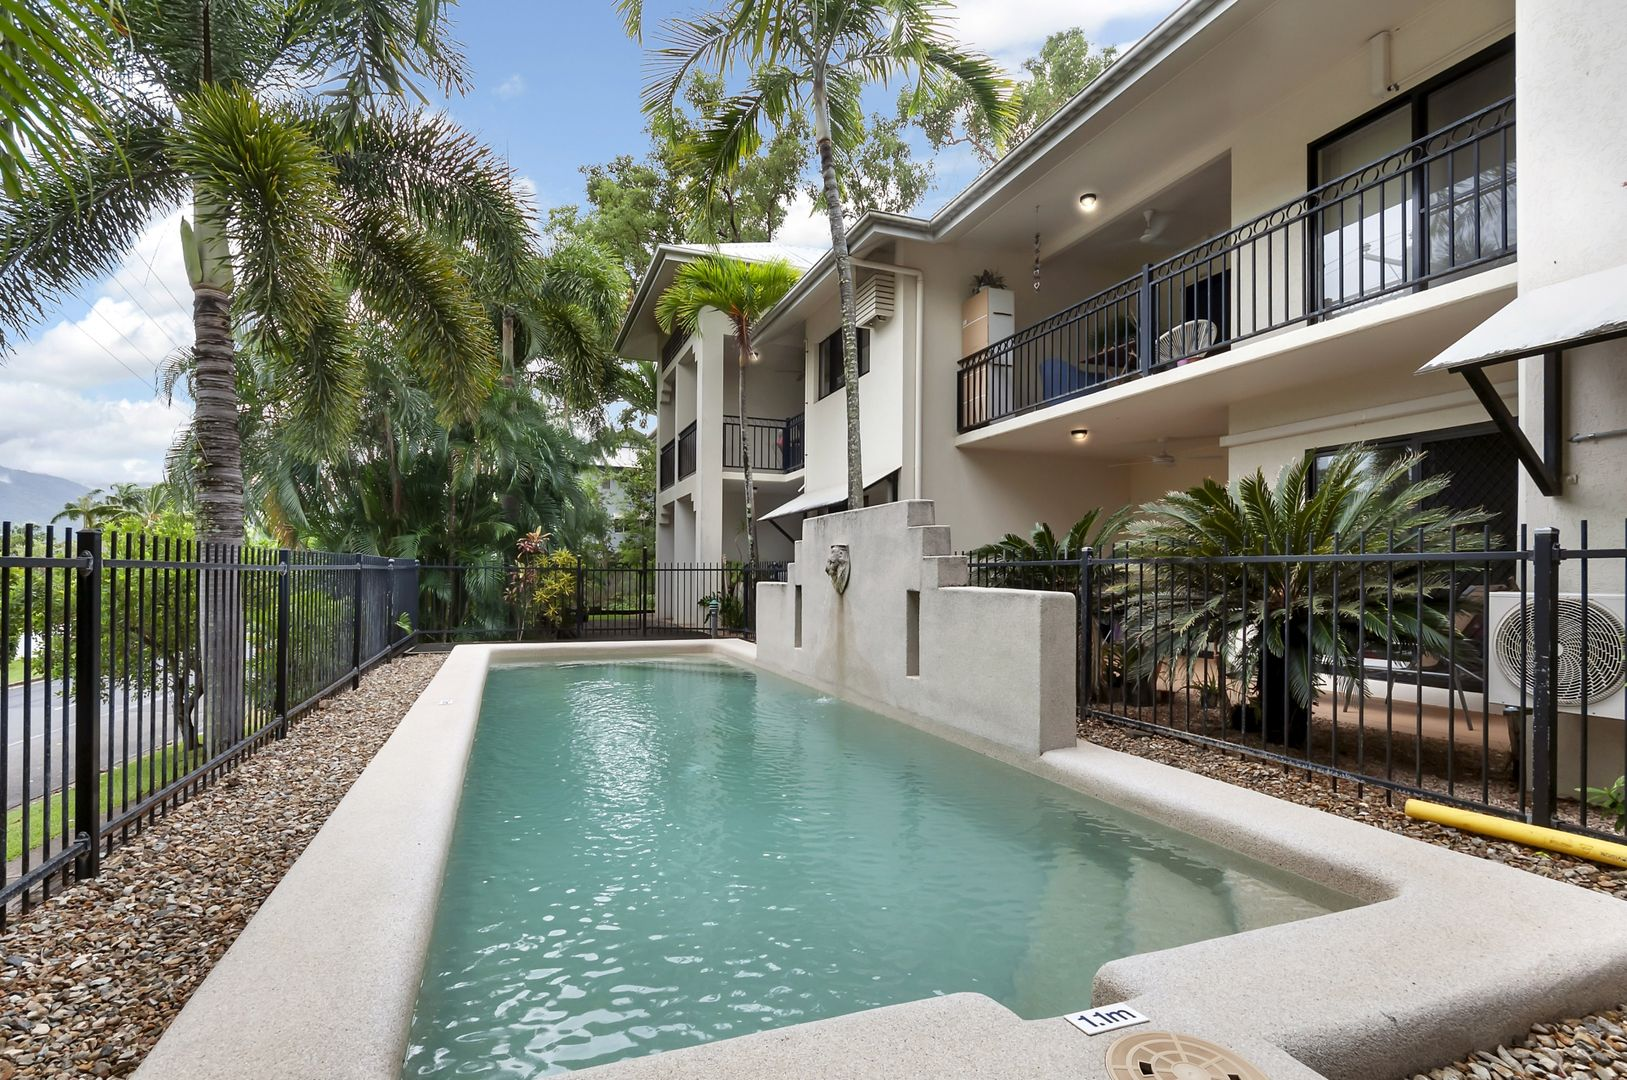 14/106 Moore  Street, Trinity Beach QLD 4879, Image 2